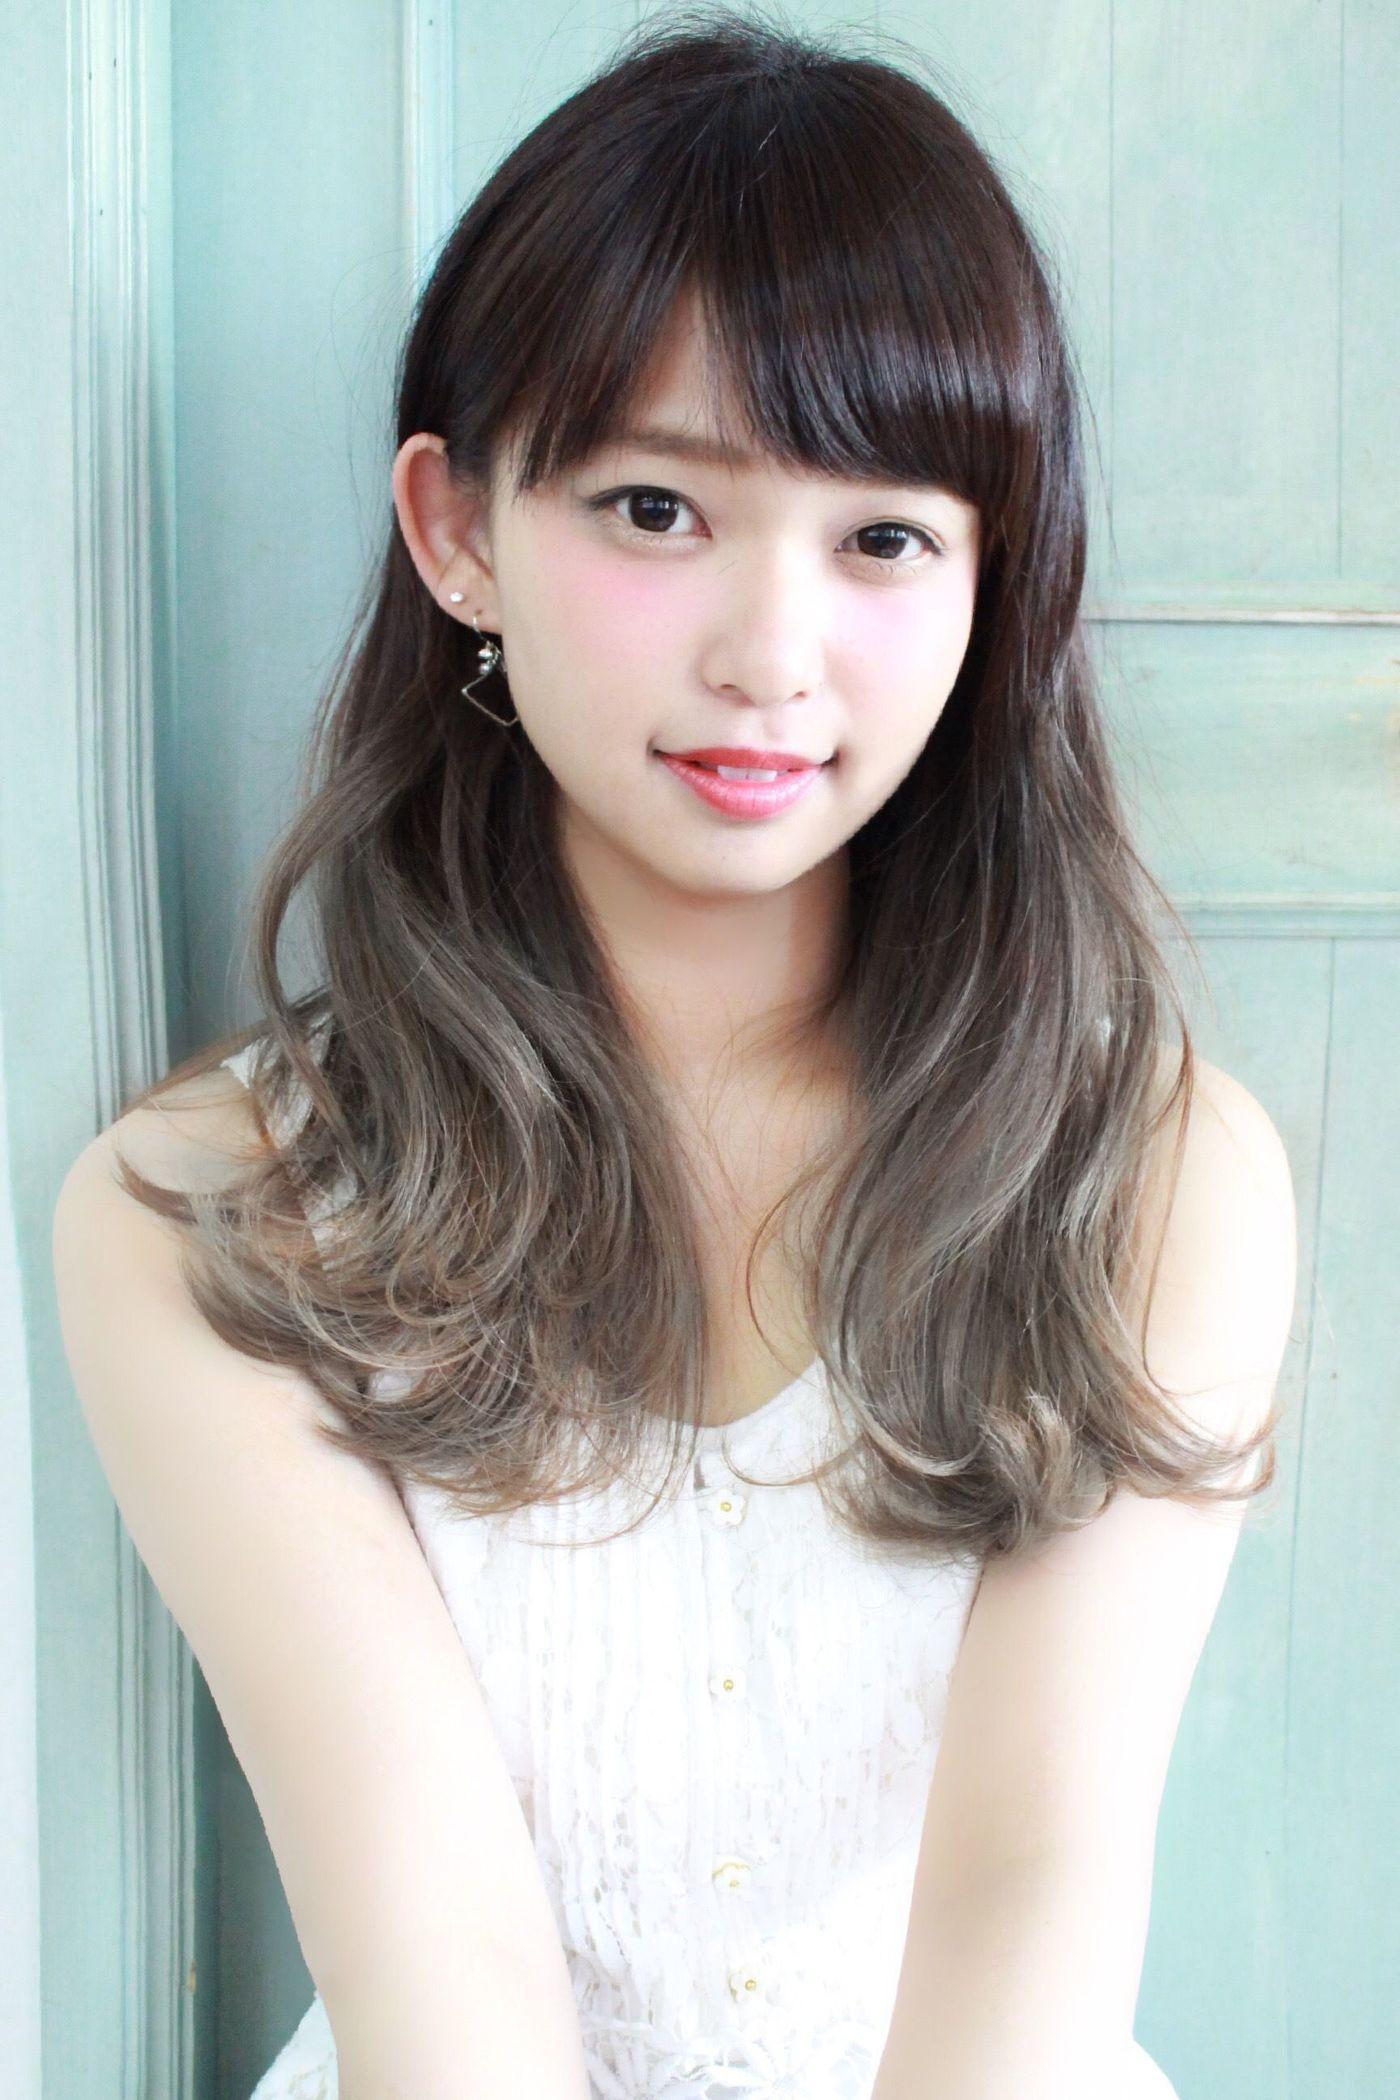 hair art chiffon[ヘアー アート シフォン] 川口東口店が投稿した画像